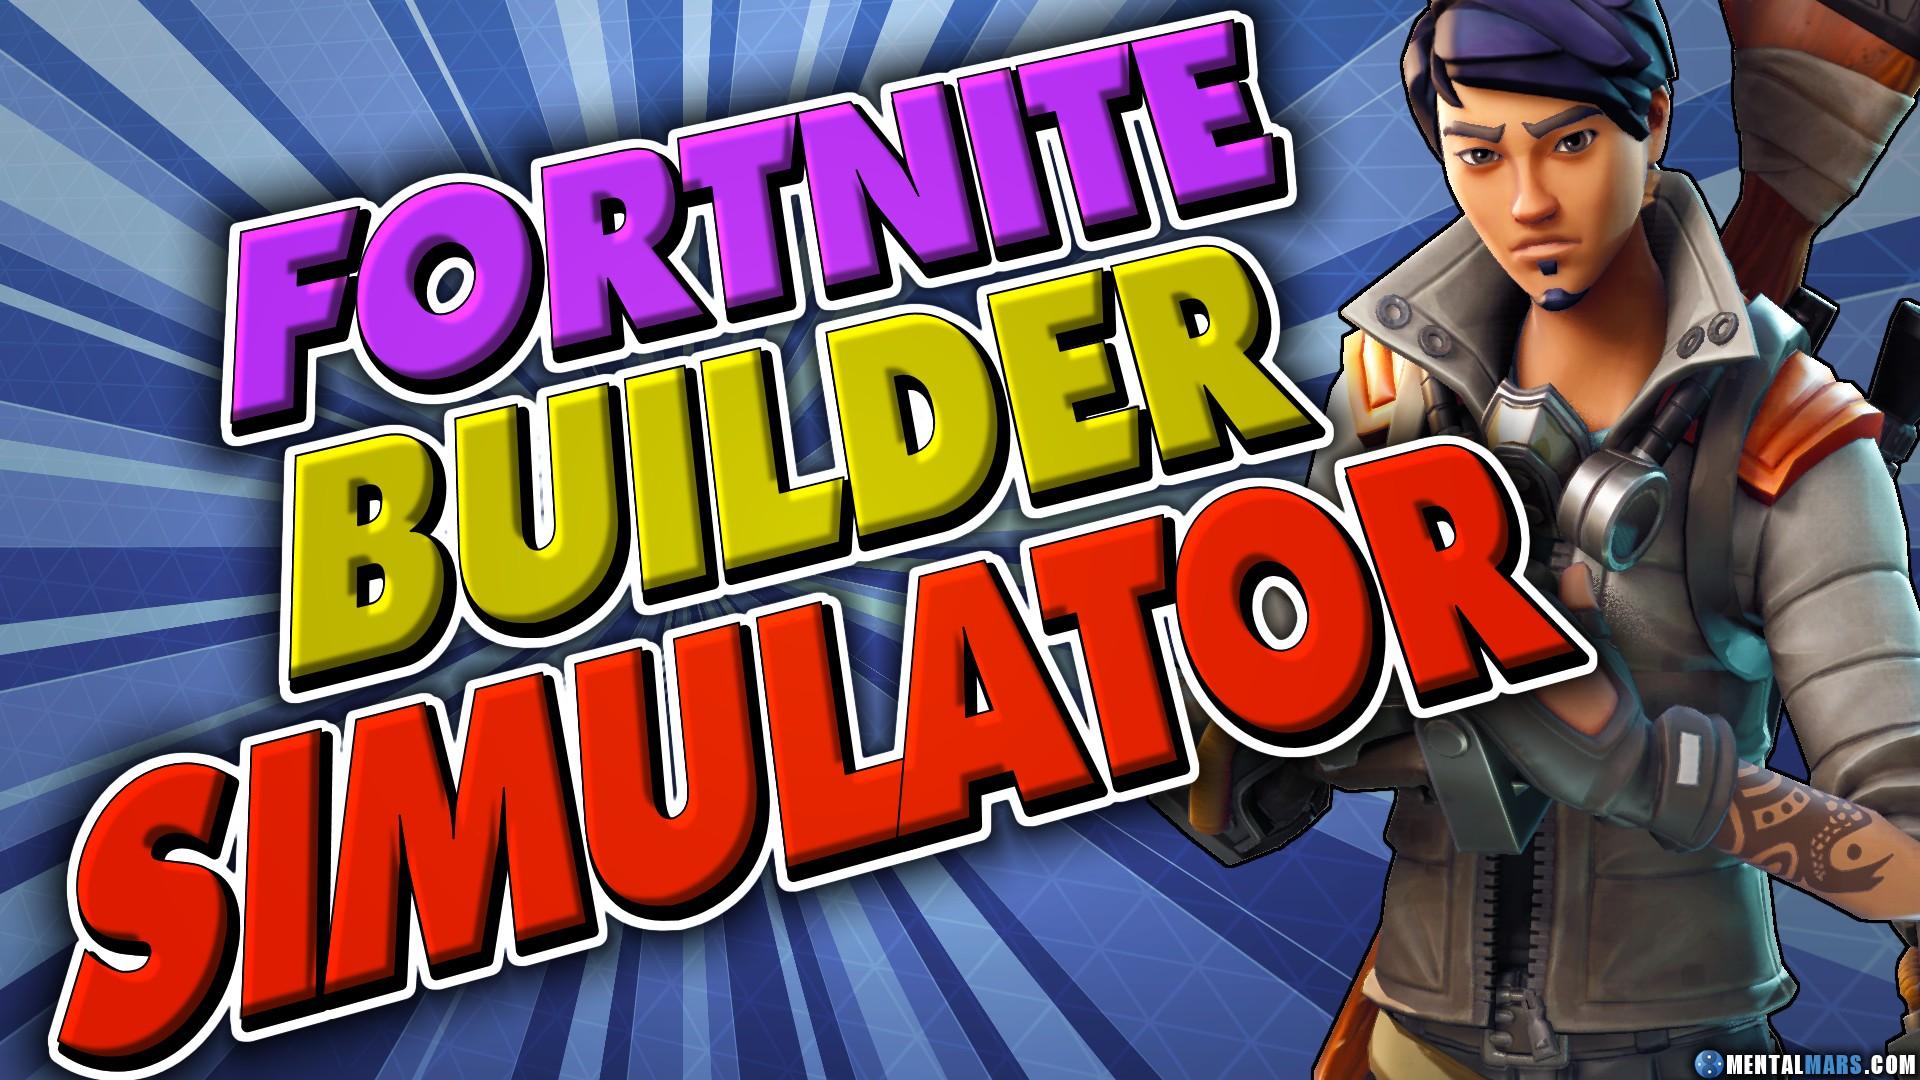 Fortnite Building Simulator » Fortnite » MentalMars